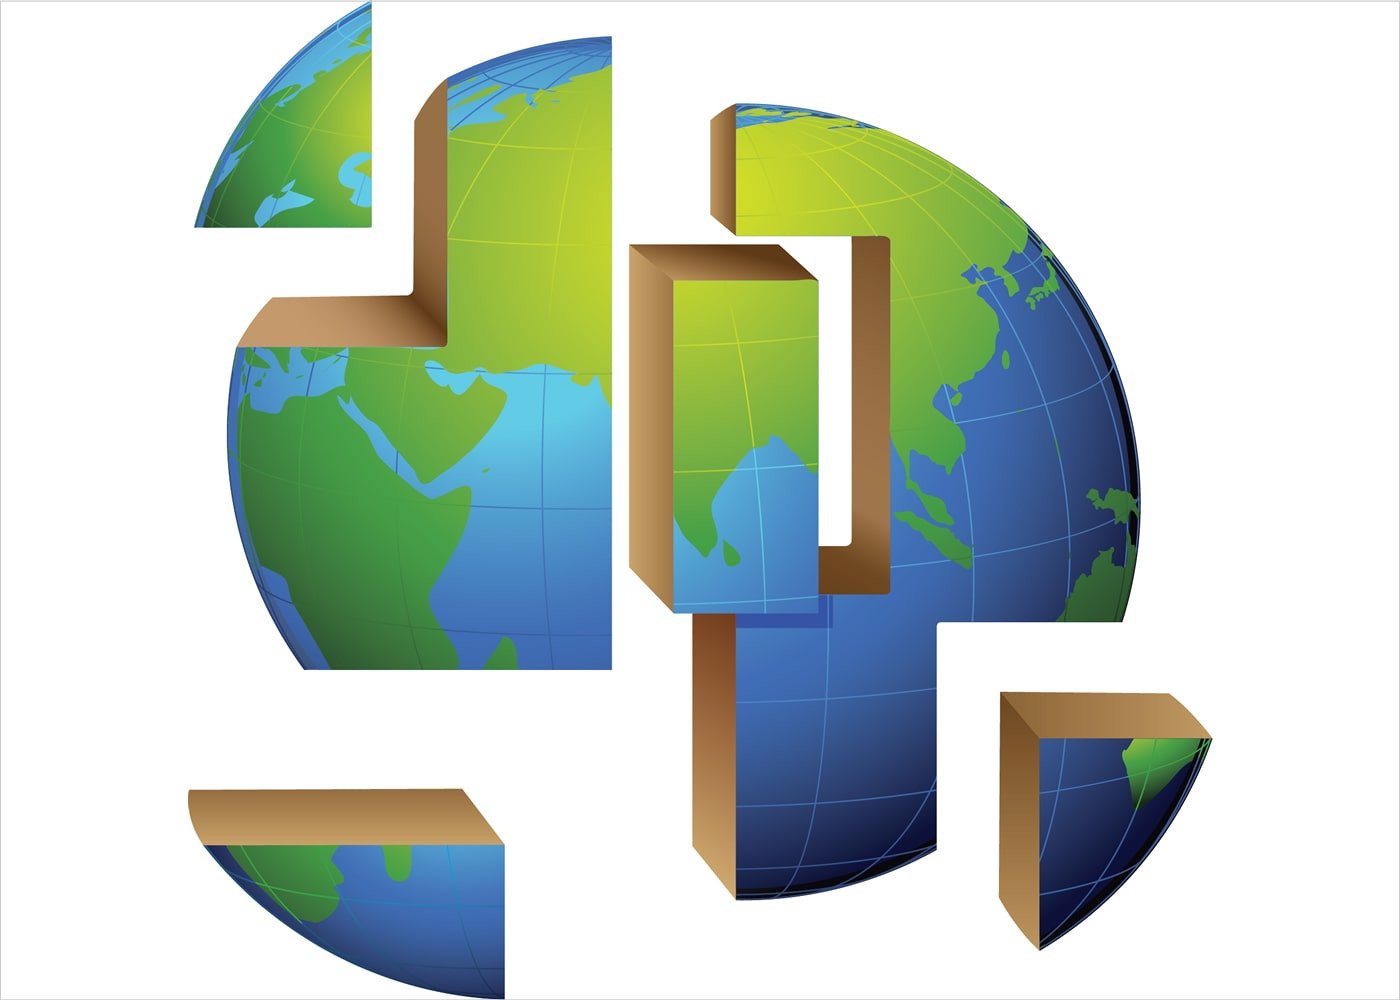 naem-webinar-2014-understanding-integrated-reporting-700x500